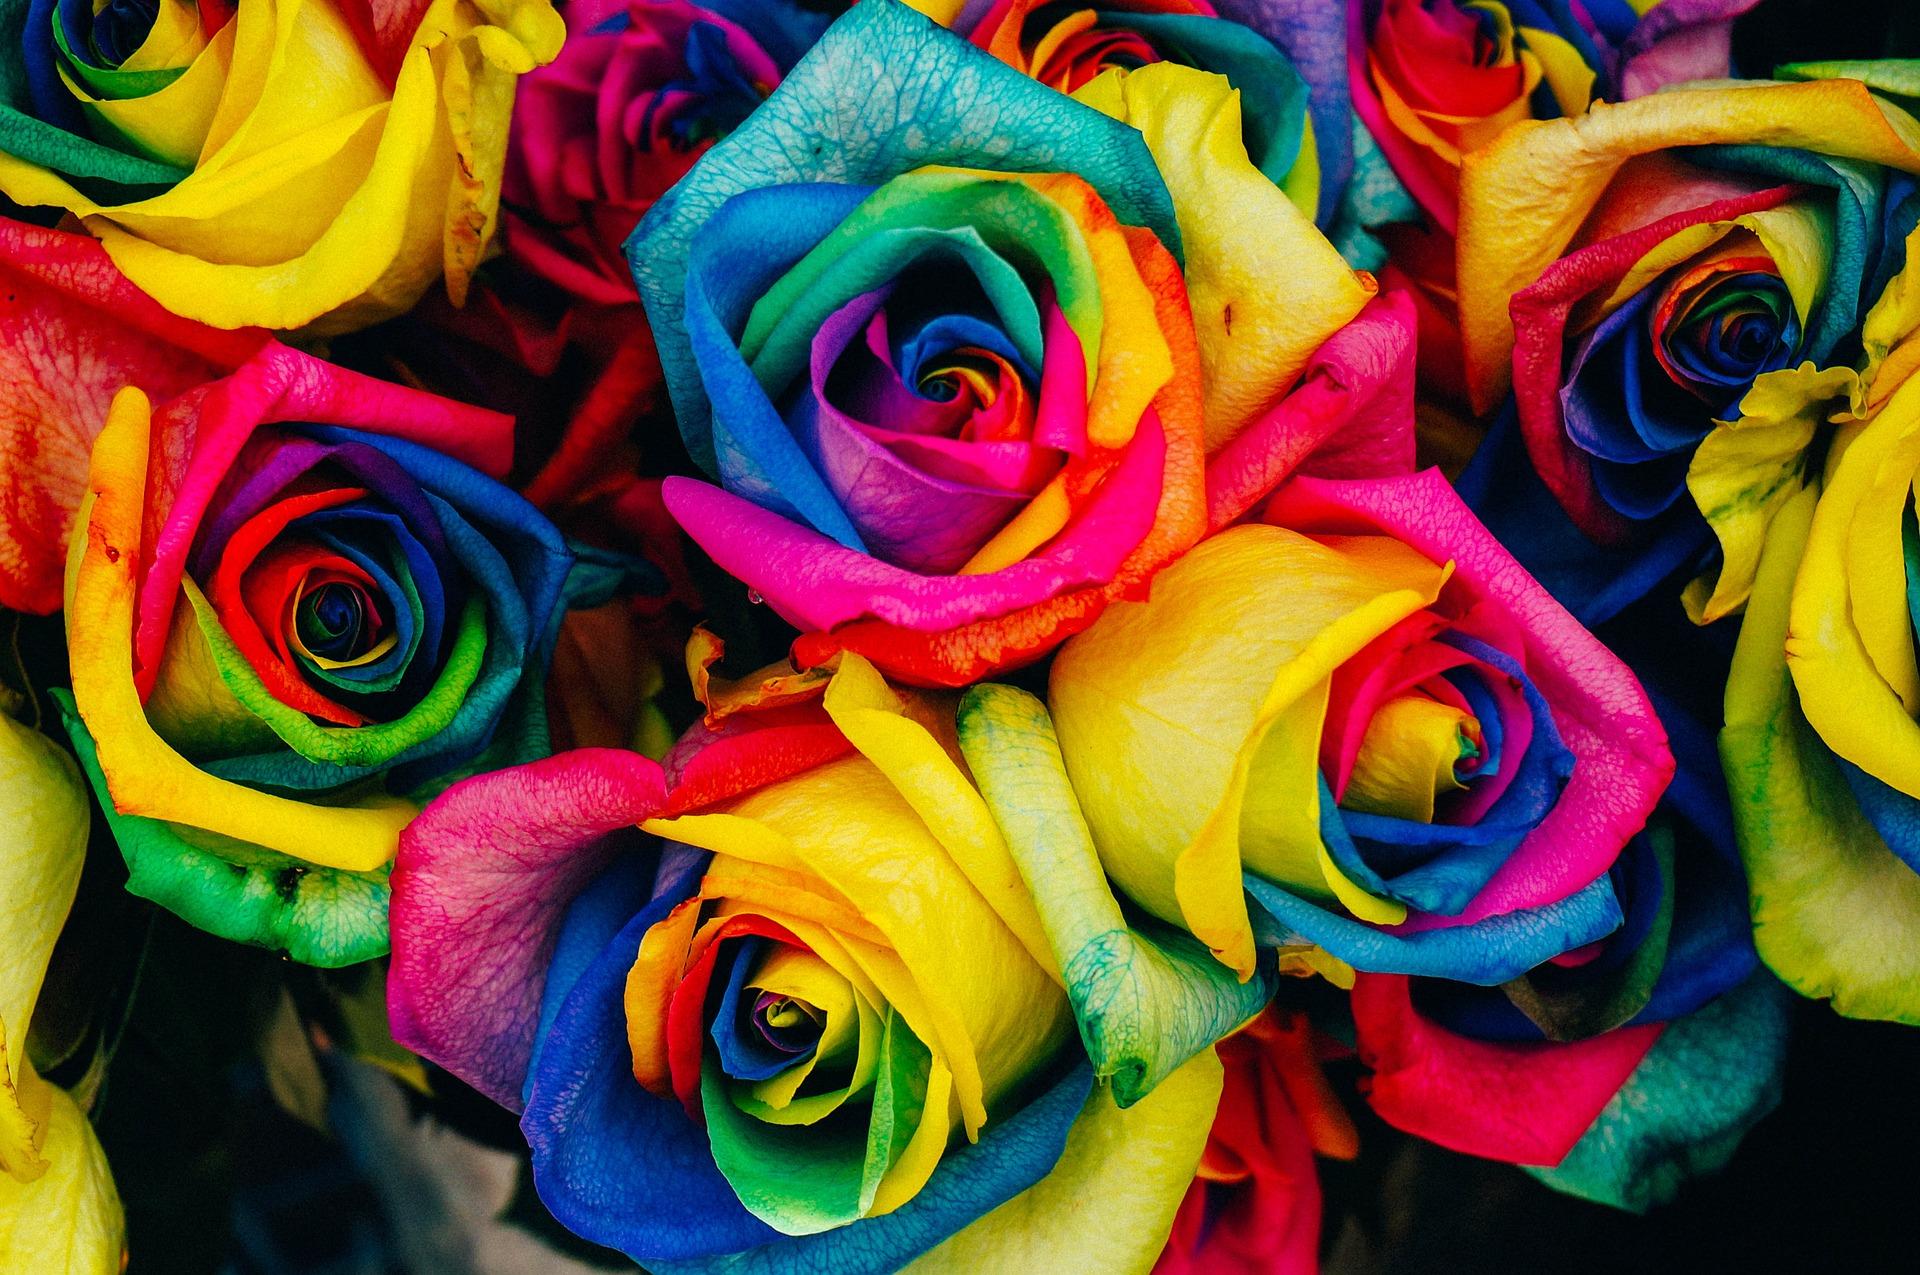 Rose Colors